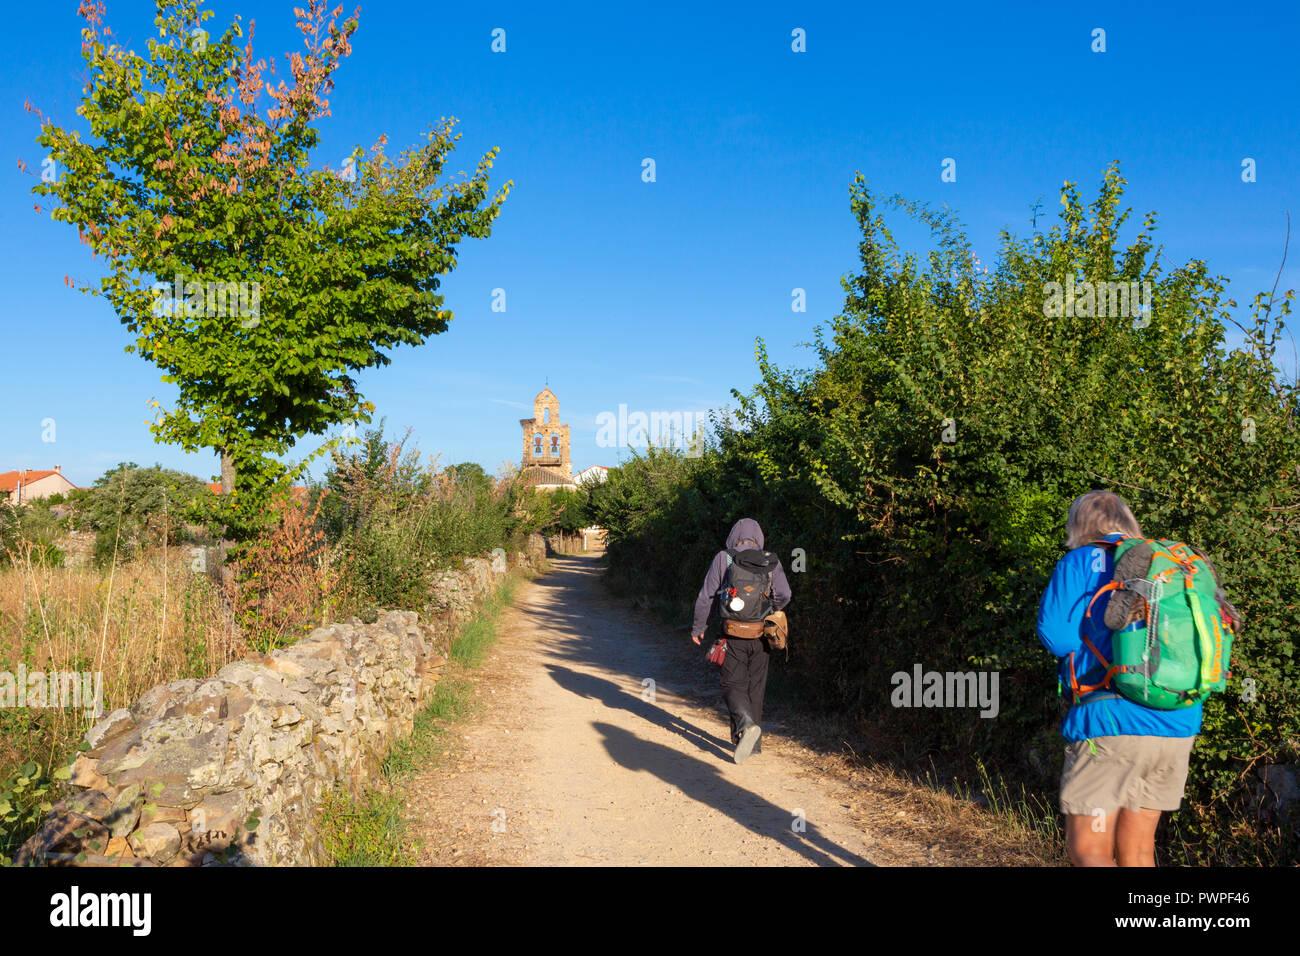 Camino de Santiago (Spain) - Pilgrims walking along the way of St.James, in the spanish meseta Stock Photo